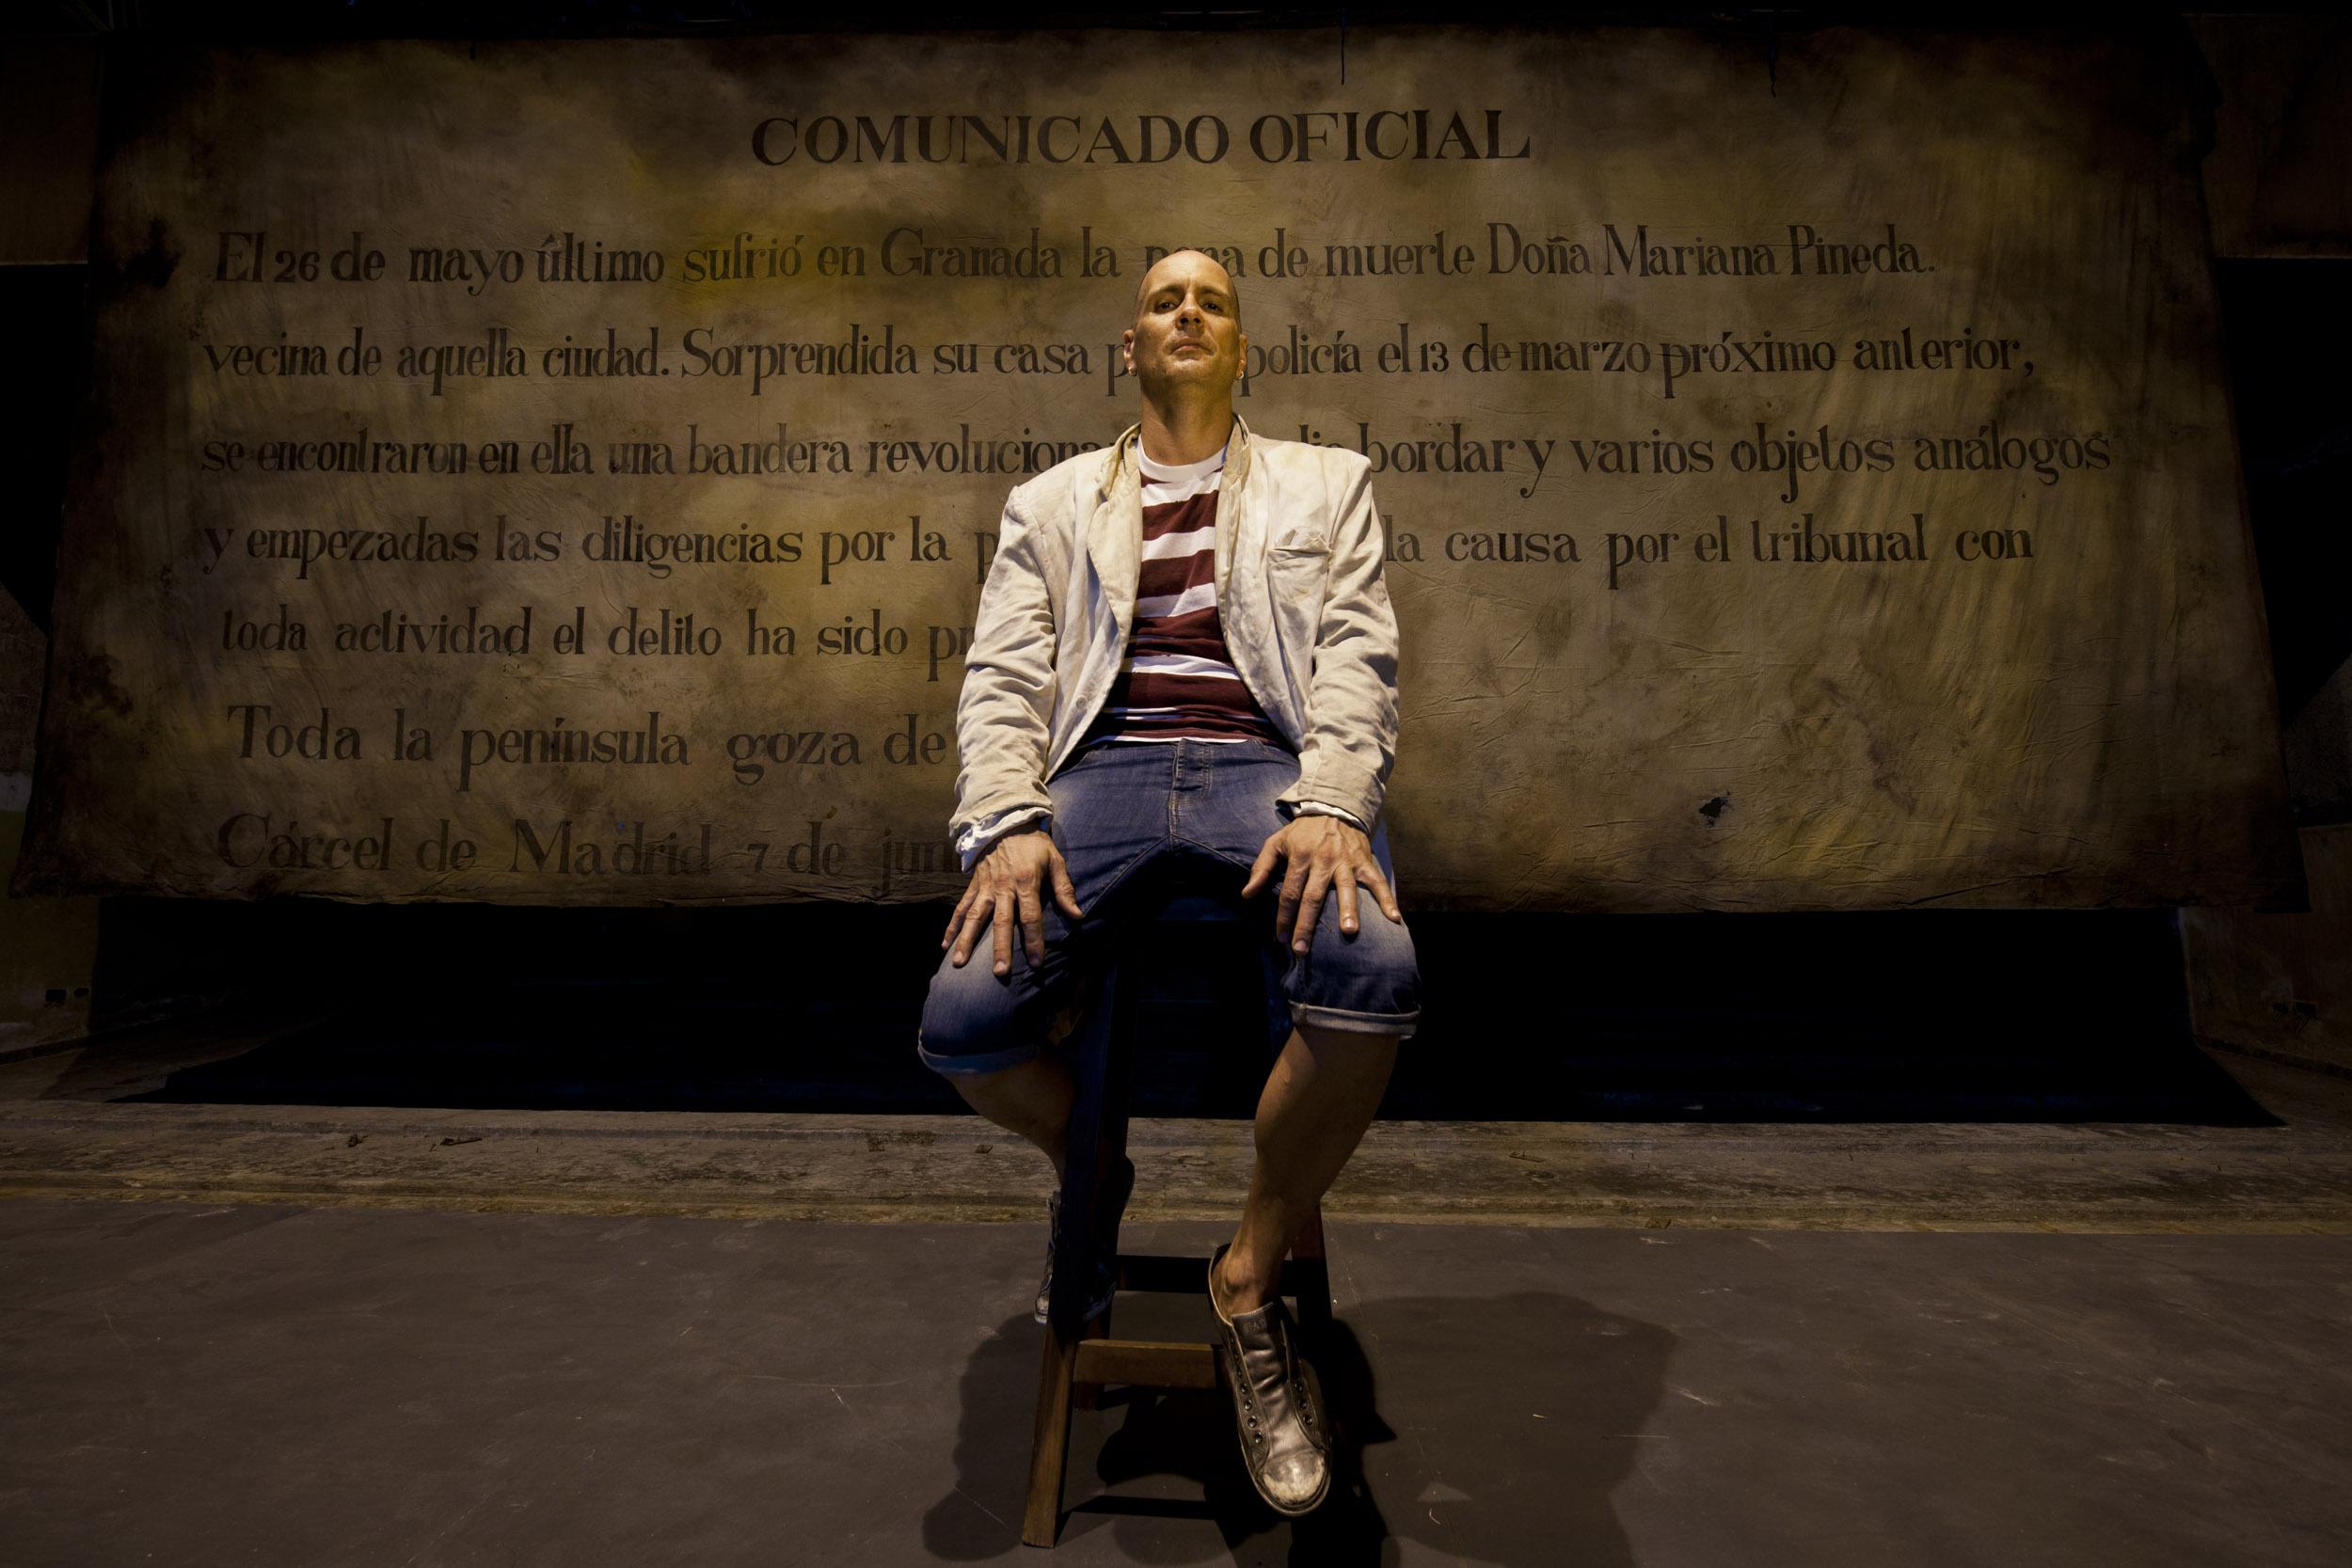 Raúl Martín, theater director - Illuminated Cuba - Hector Garrido, Aerial and human photography